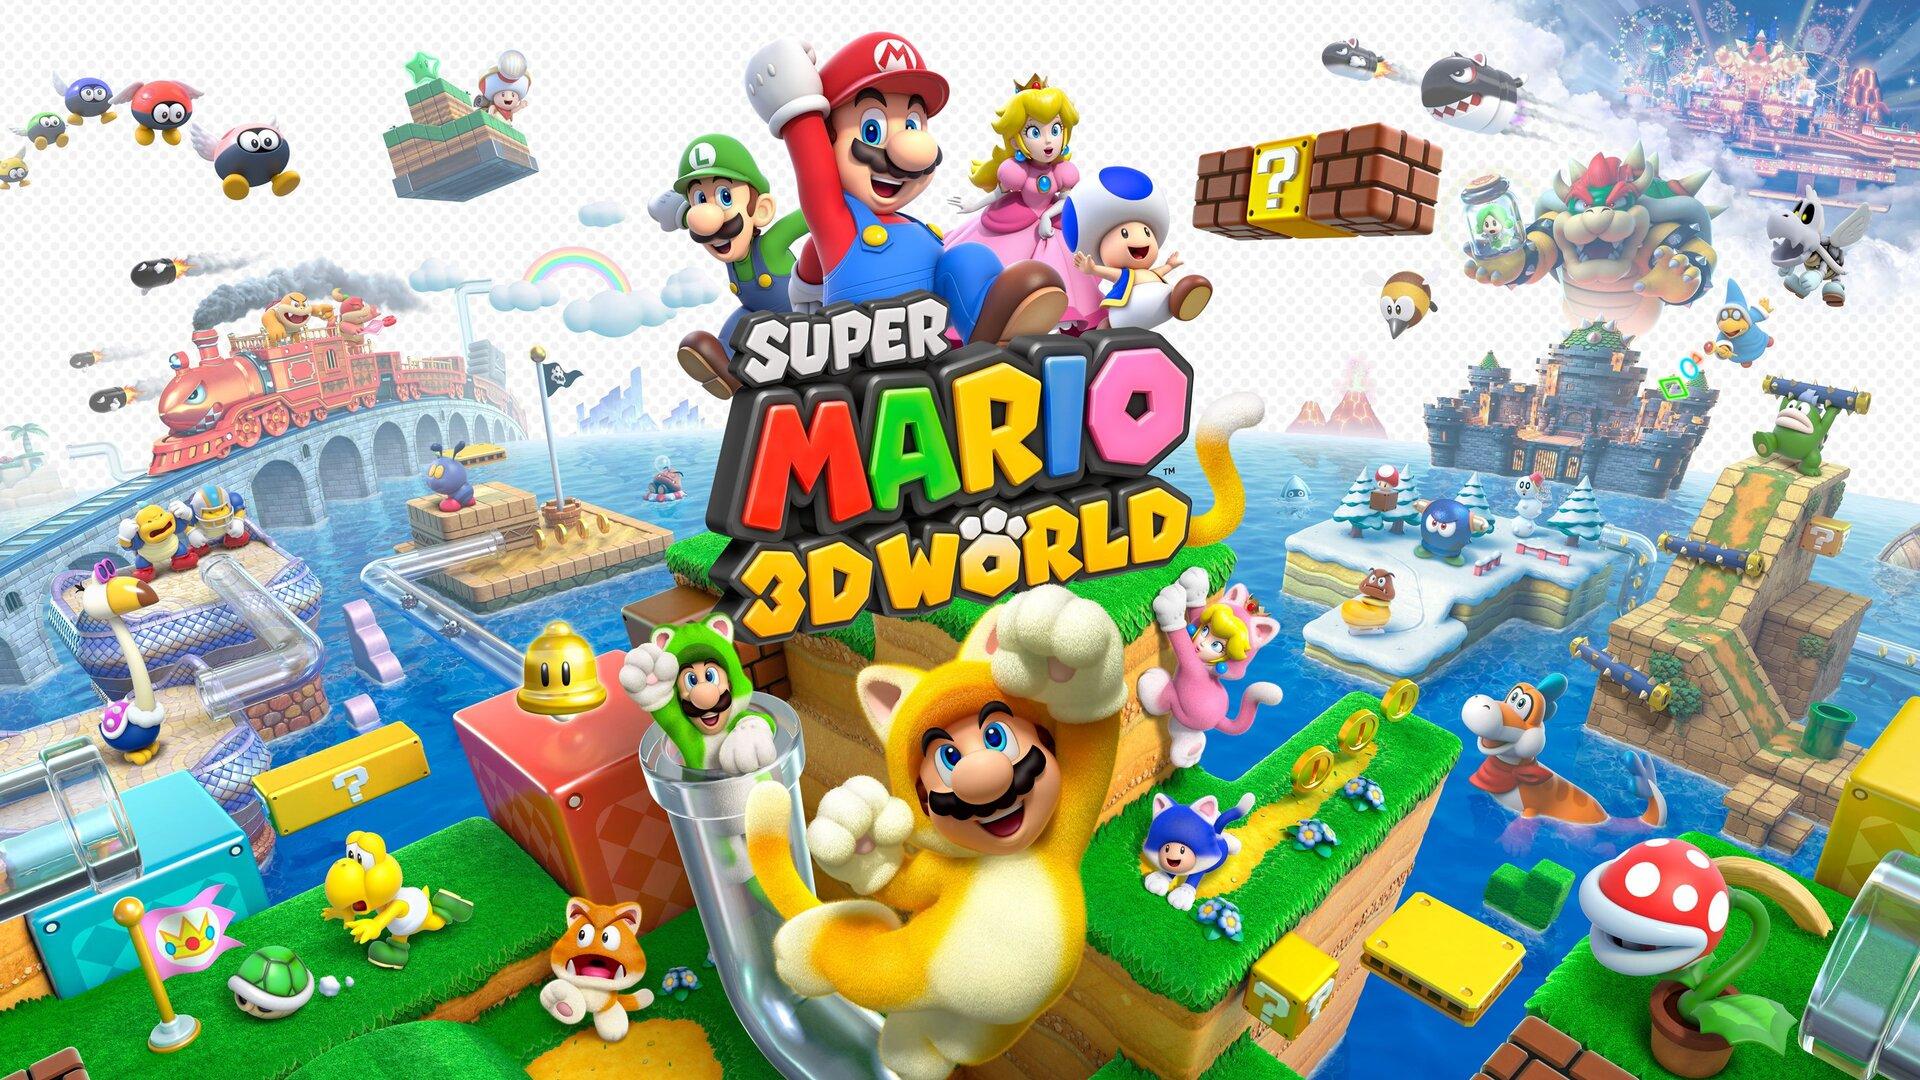 1920x1080 Super Mario 3d World Laptop Full Hd 1080p Hd 4k